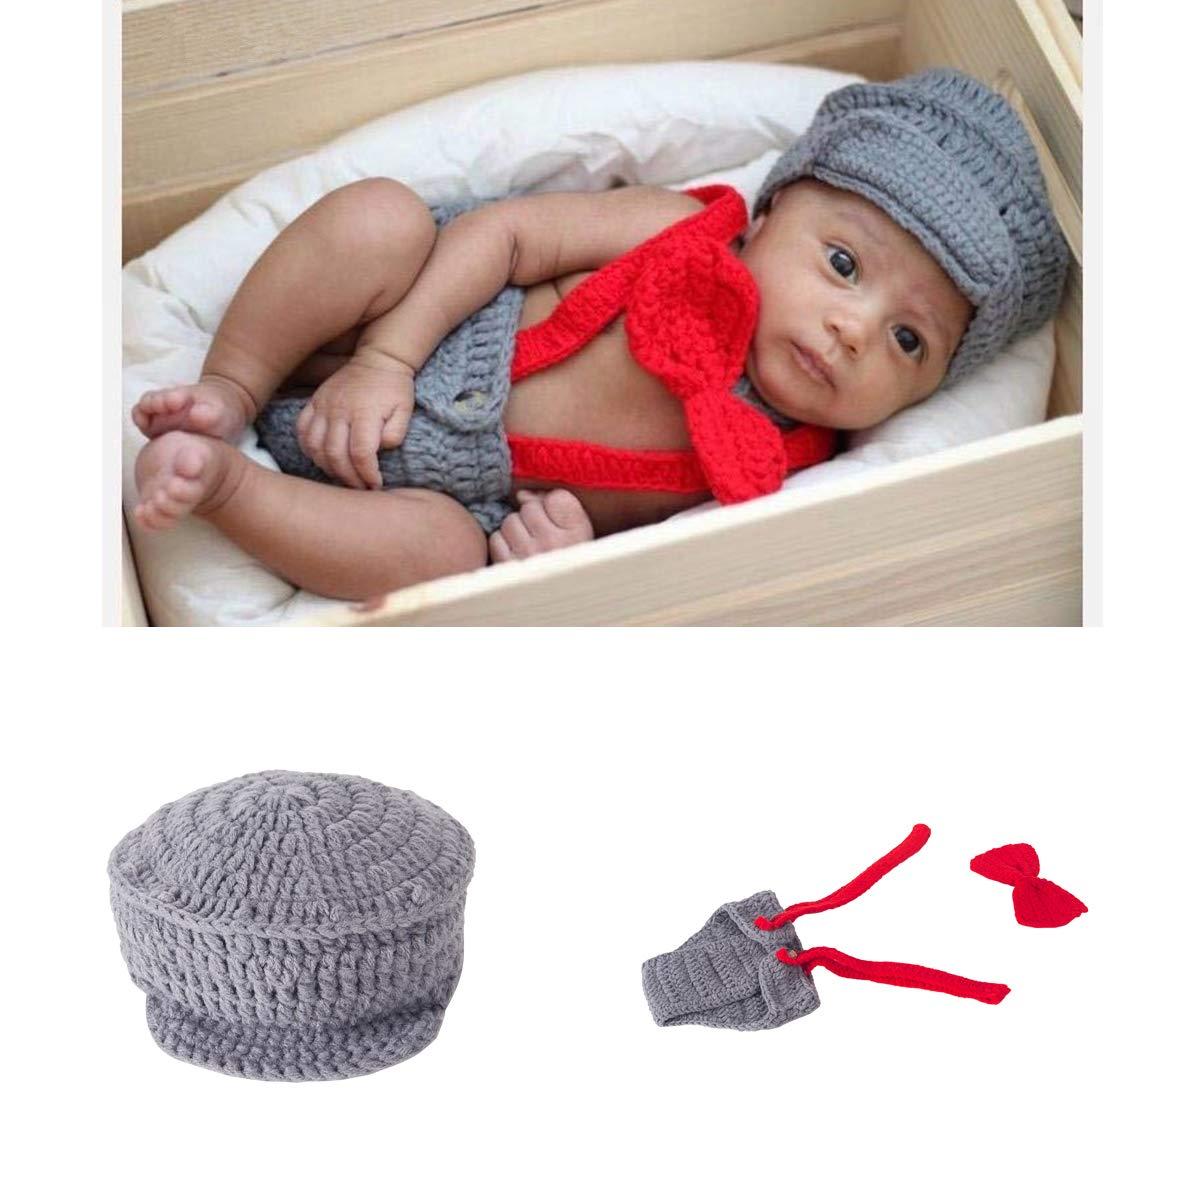 0f766d76de3 Amazon.com  Newborn Baby Boy Costume Crochet Outfits Photography Props Cap  Beanie with Suspenders Bowtie Diaper (0-12months)  Camera   Photo